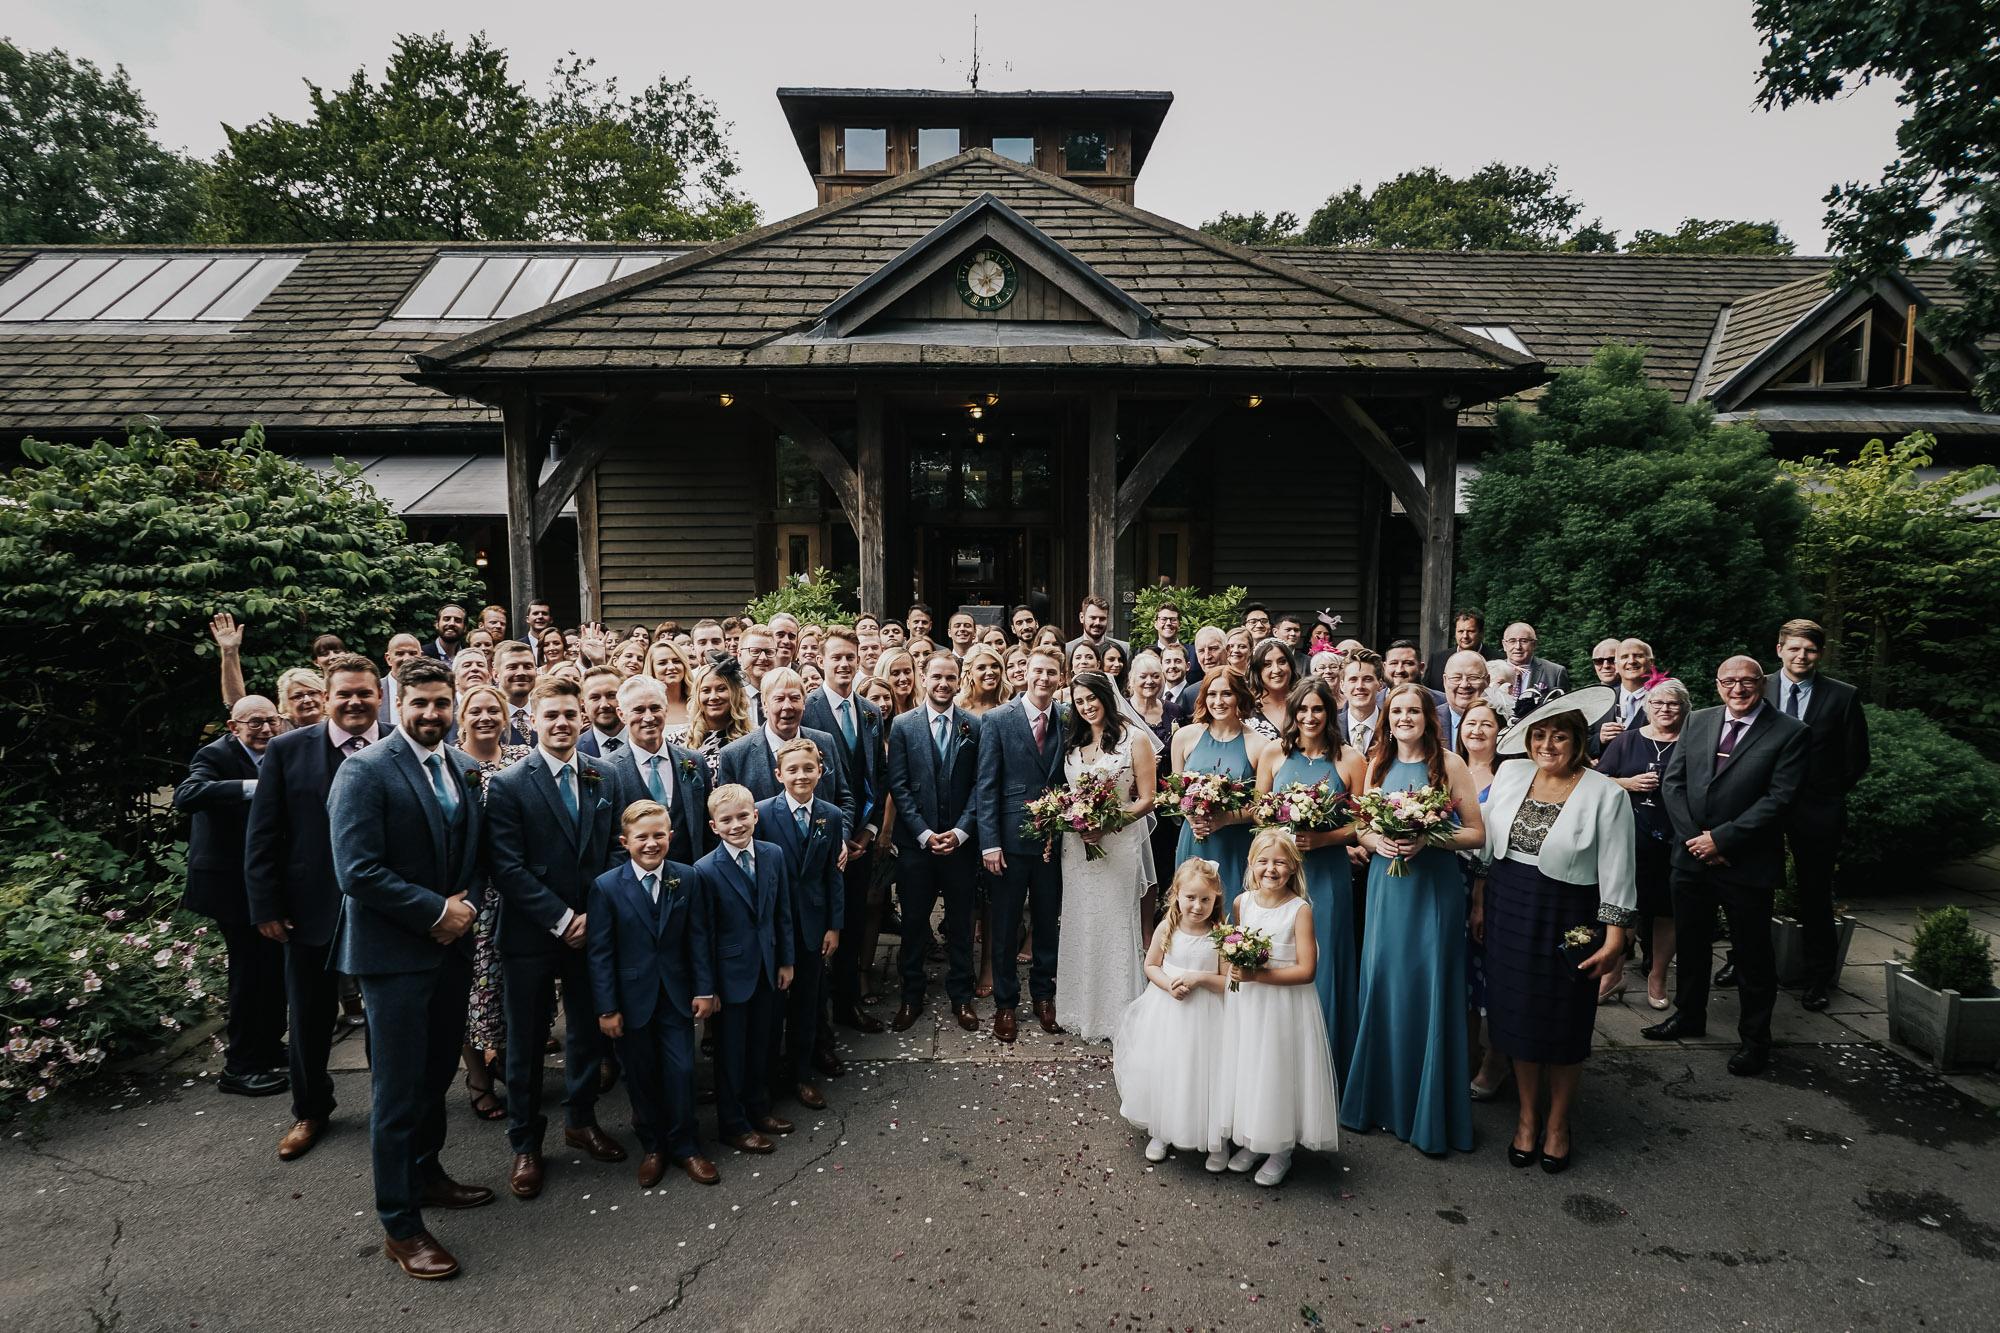 Oak tree of peover wedding photography cheshire wedding photographer (25 of 56).jpg